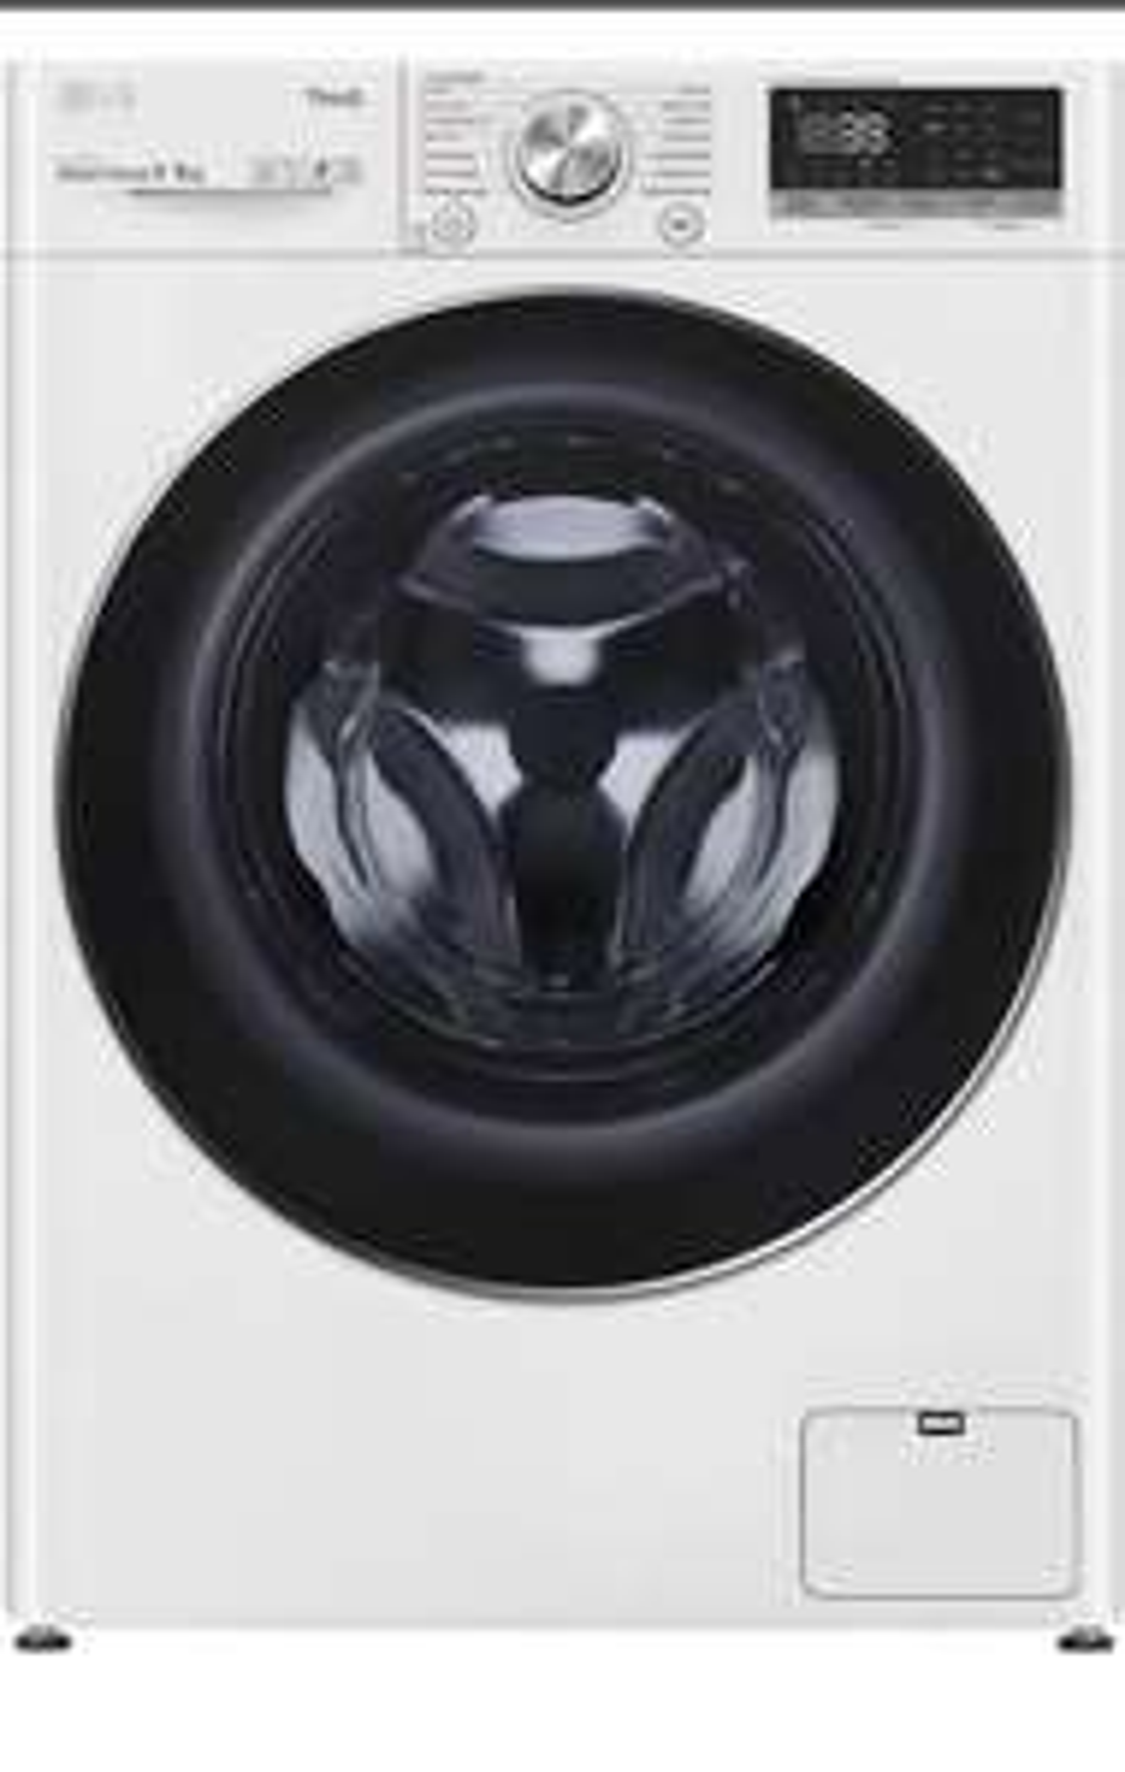 Lave-linge séchant LG F964V72WRHT - 9 kg (lavage) / 6 kg (séchage), 1400 trs/min, Eco Hybrid, TurboWash360, A